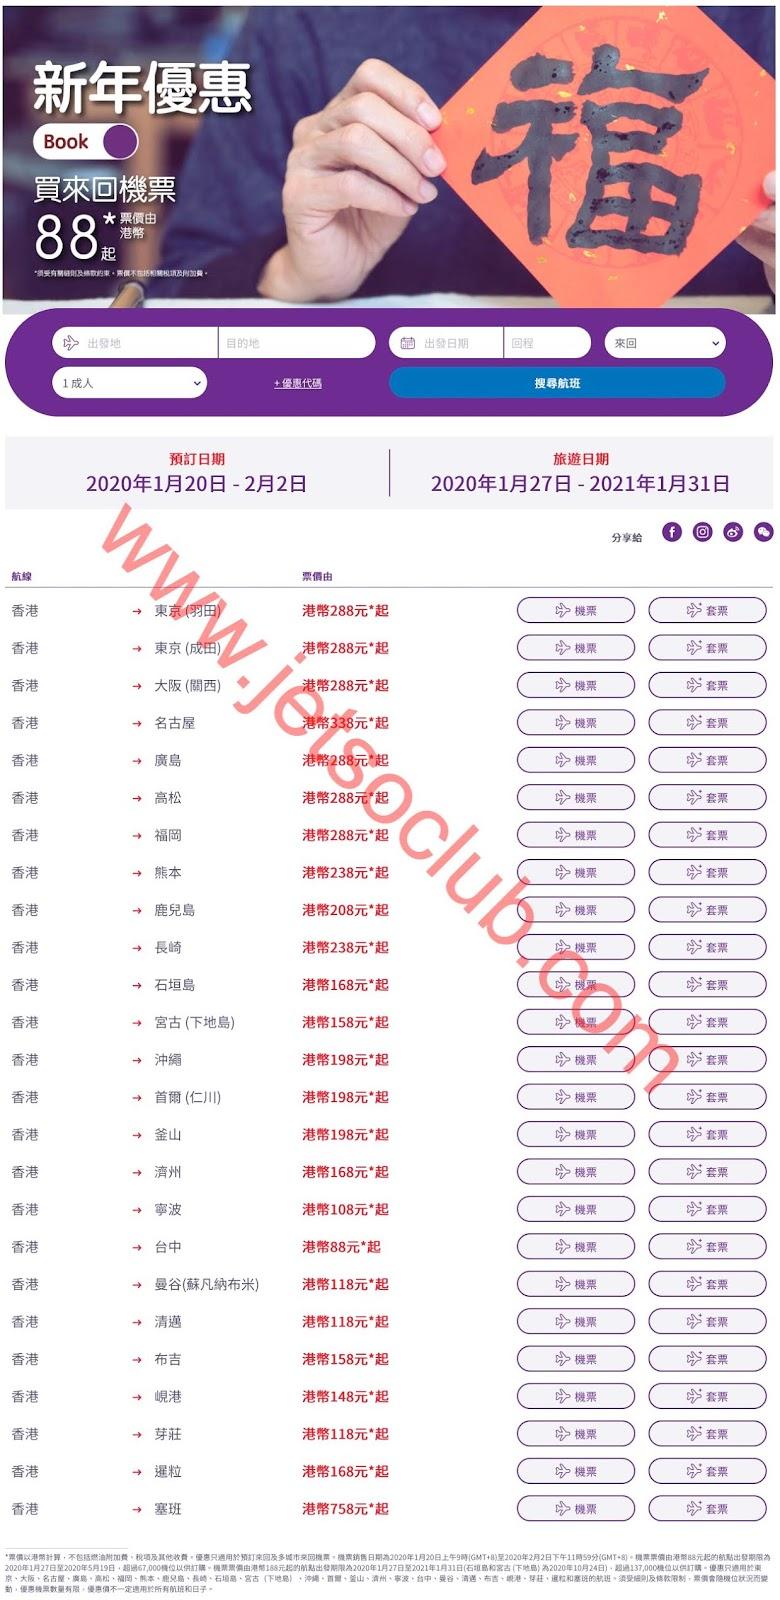 HK Express:新年優惠 單程機票 $88起(訂購至2/2) ( Jetso Club 著數俱樂部 )